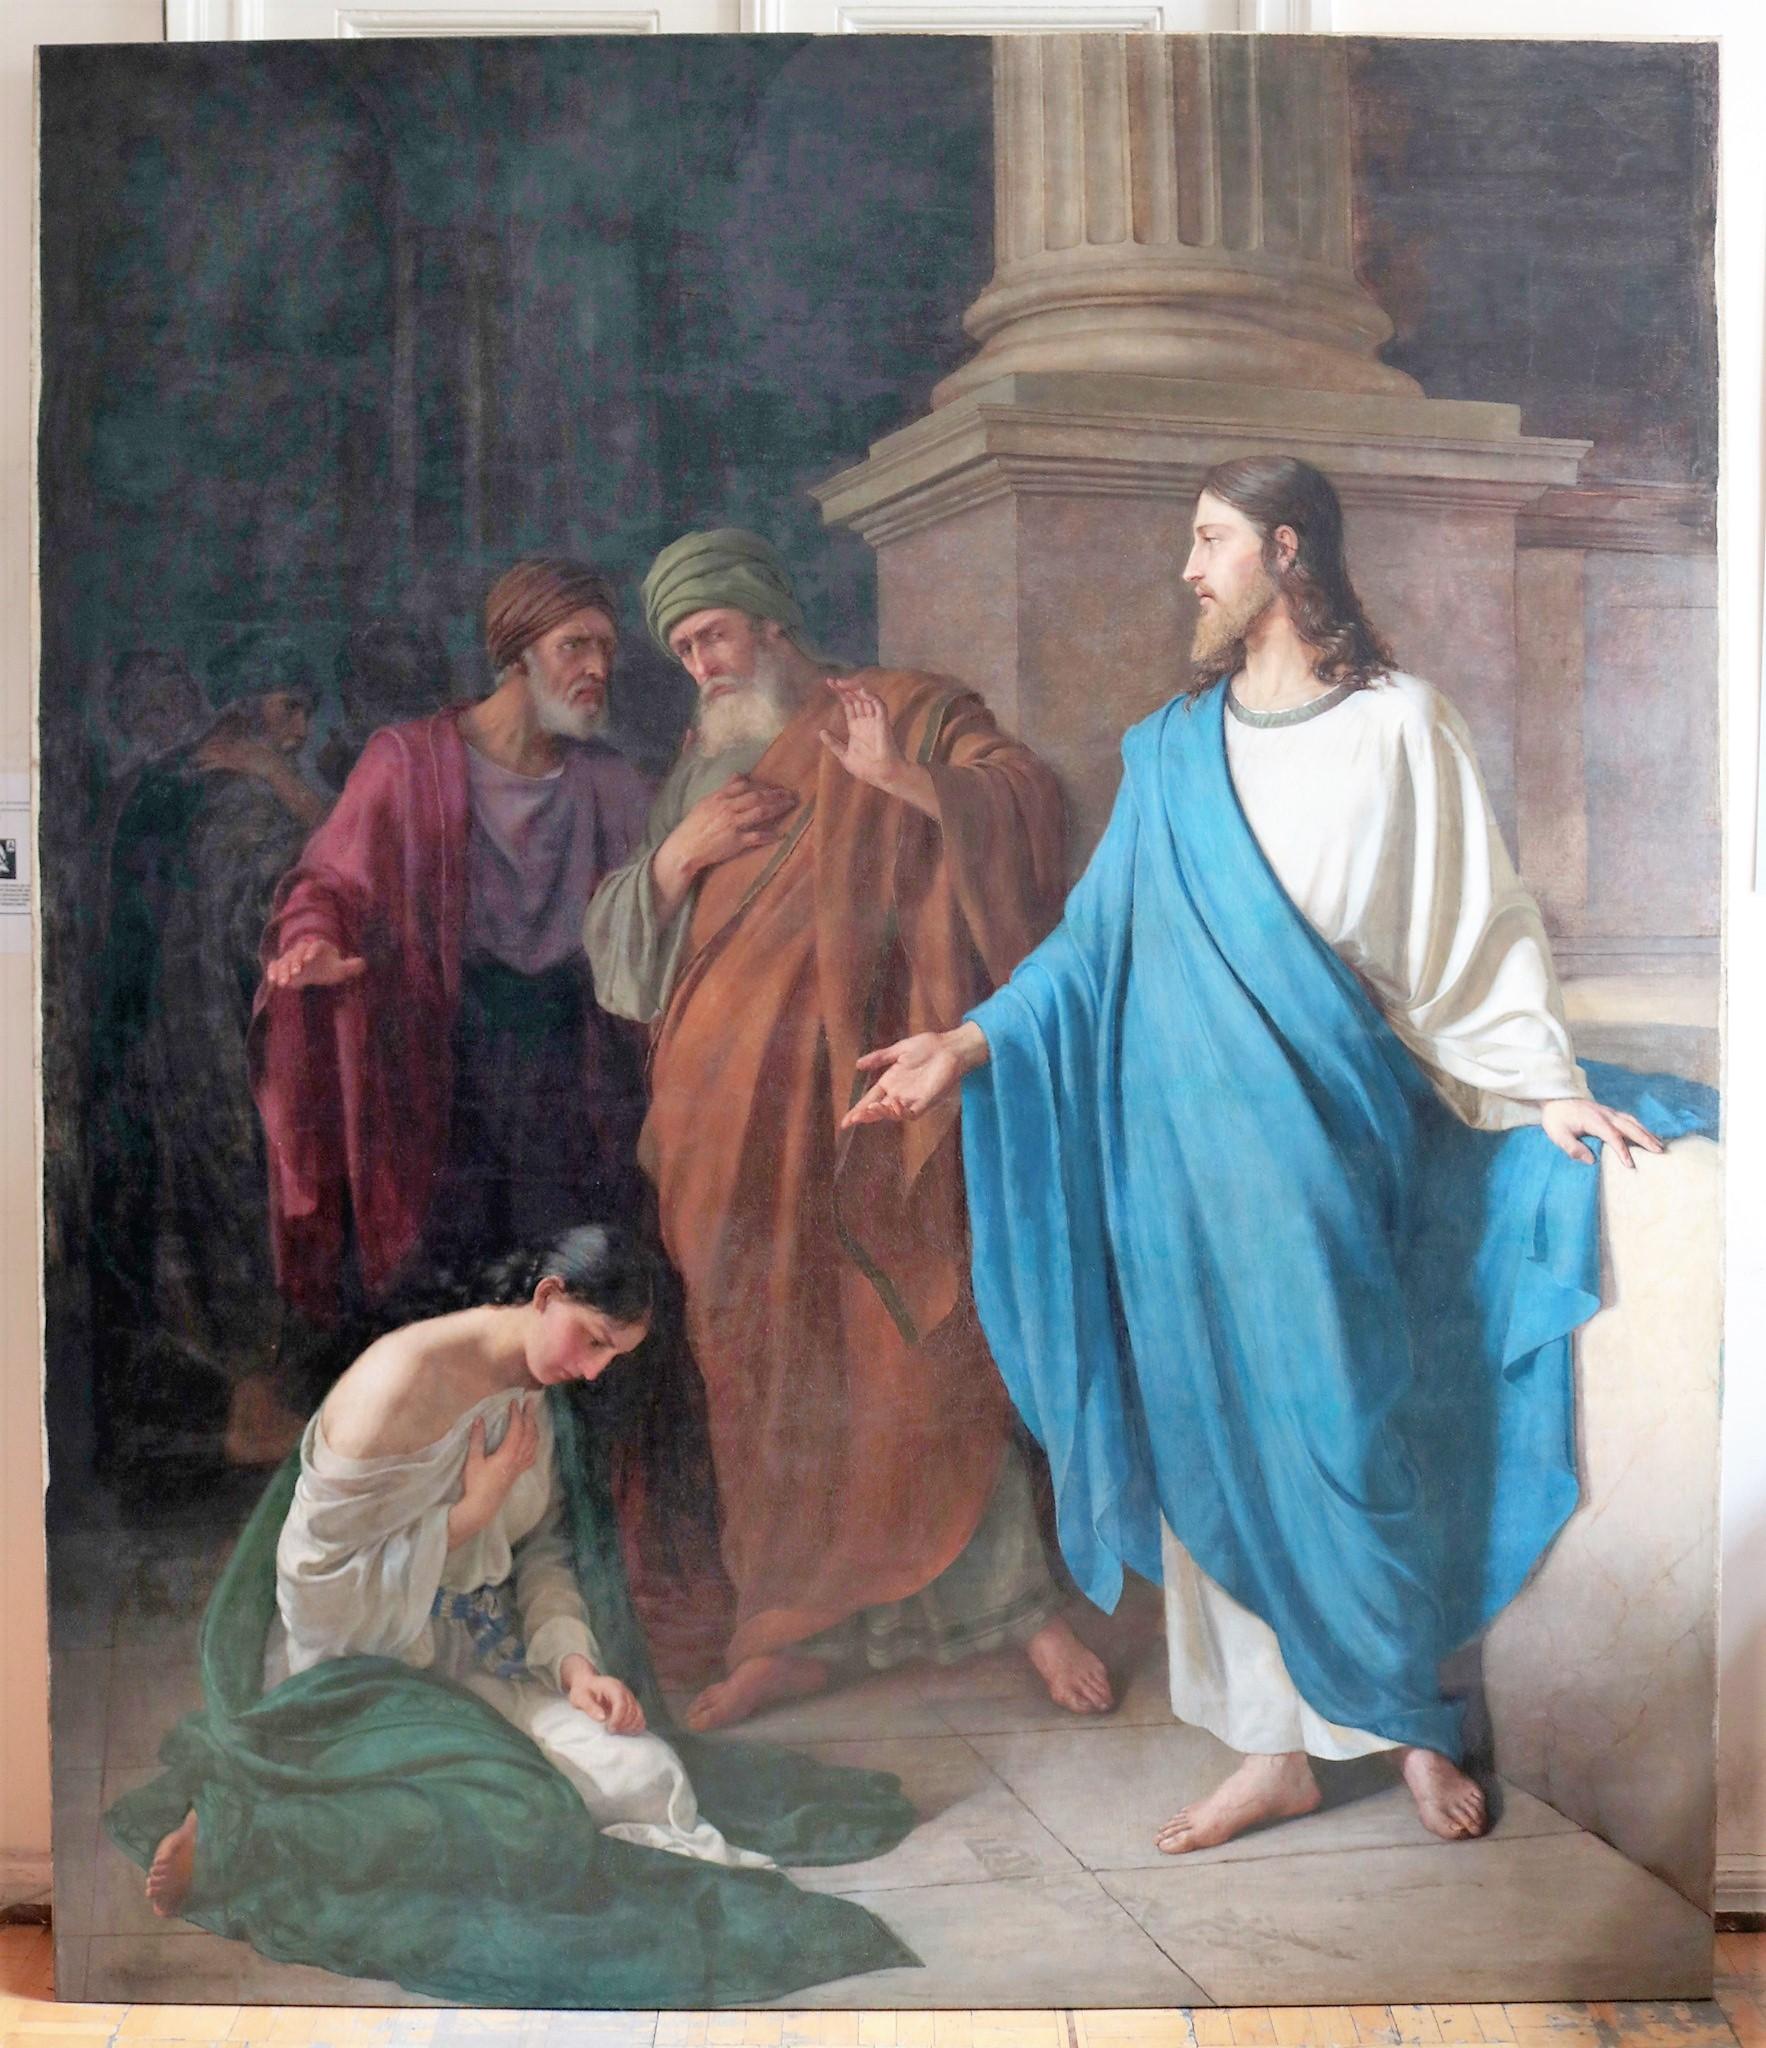 полотно «Христос и грешница», после реставрации